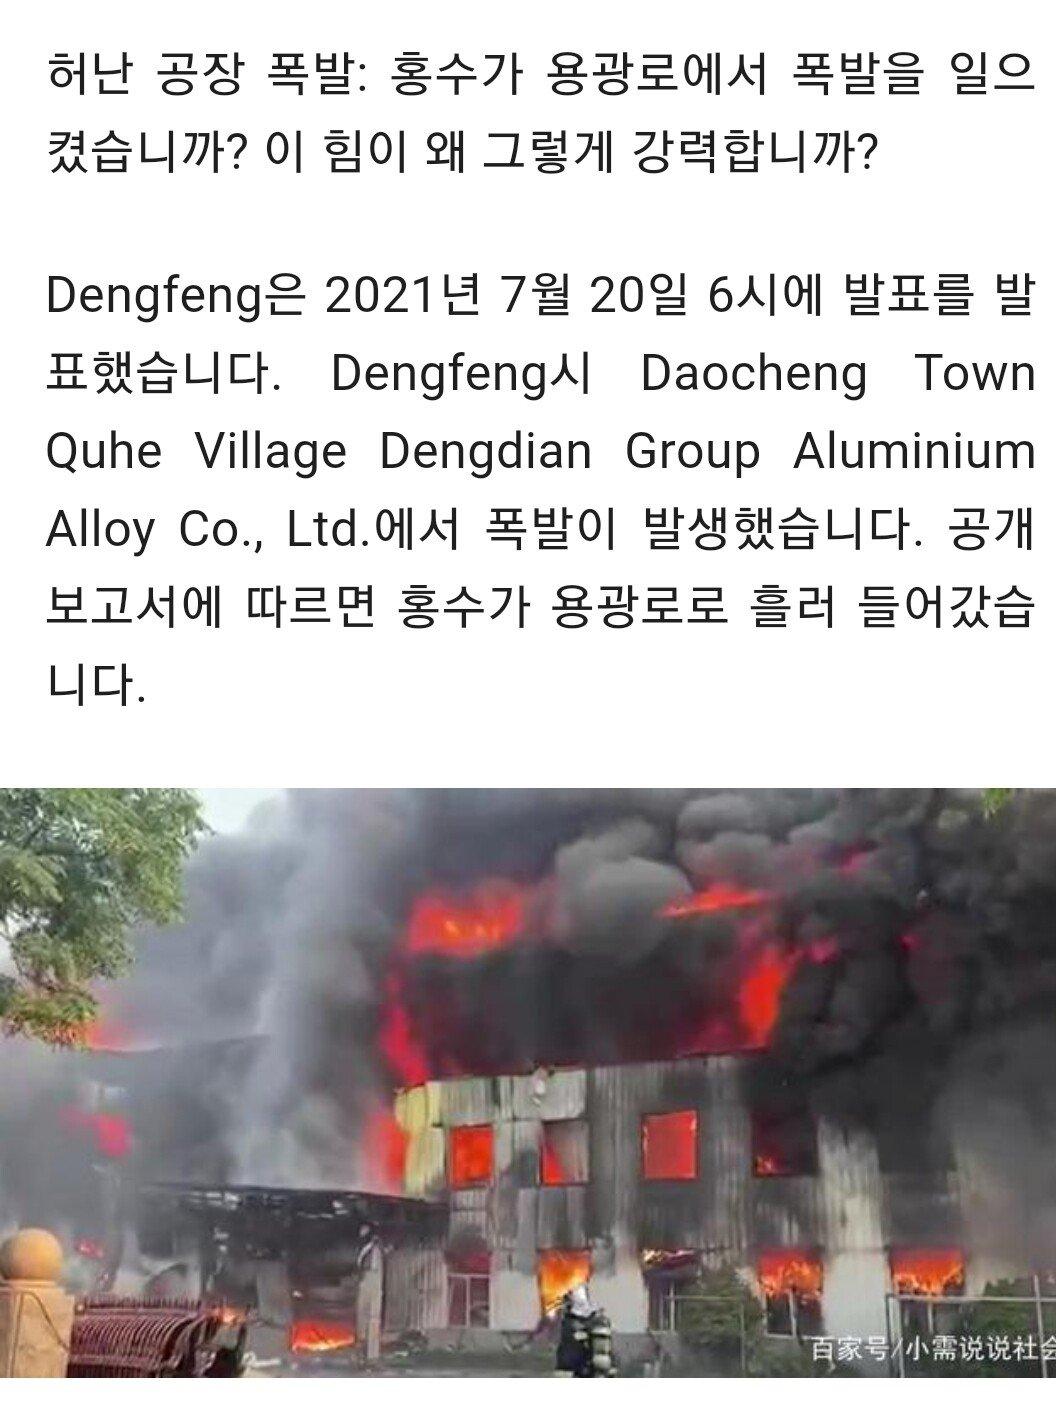 853944530_rdTQIgtG_17ac478aa95510c10.jpg 어제 중국에서 발생한 대폭발